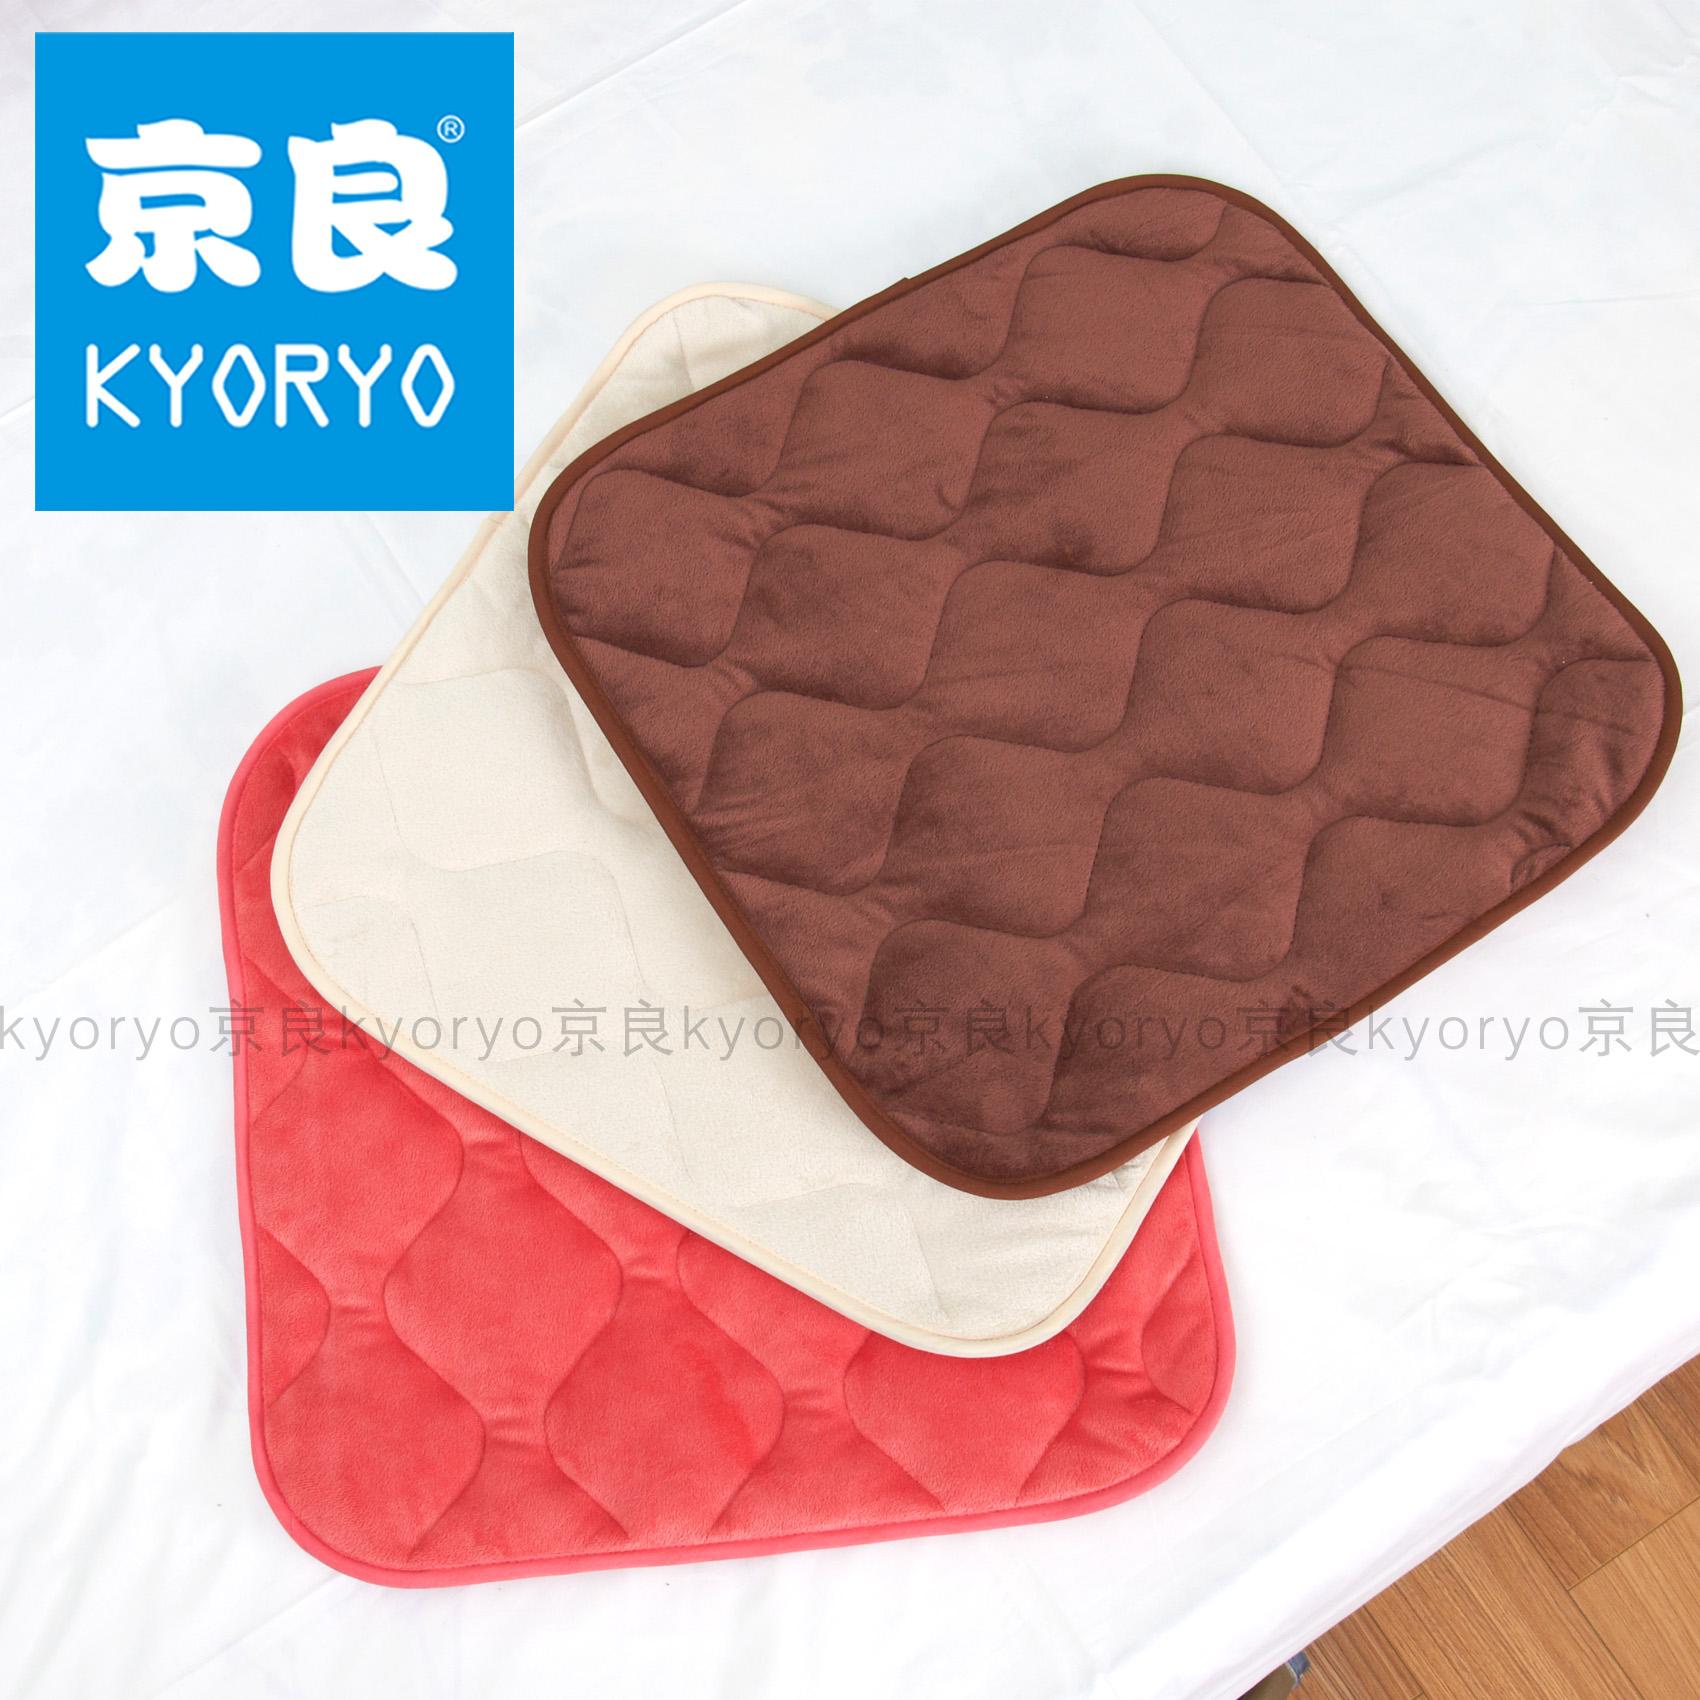 infrared thermal soft cushion 50x50 cushion sofa cushion. Black Bedroom Furniture Sets. Home Design Ideas